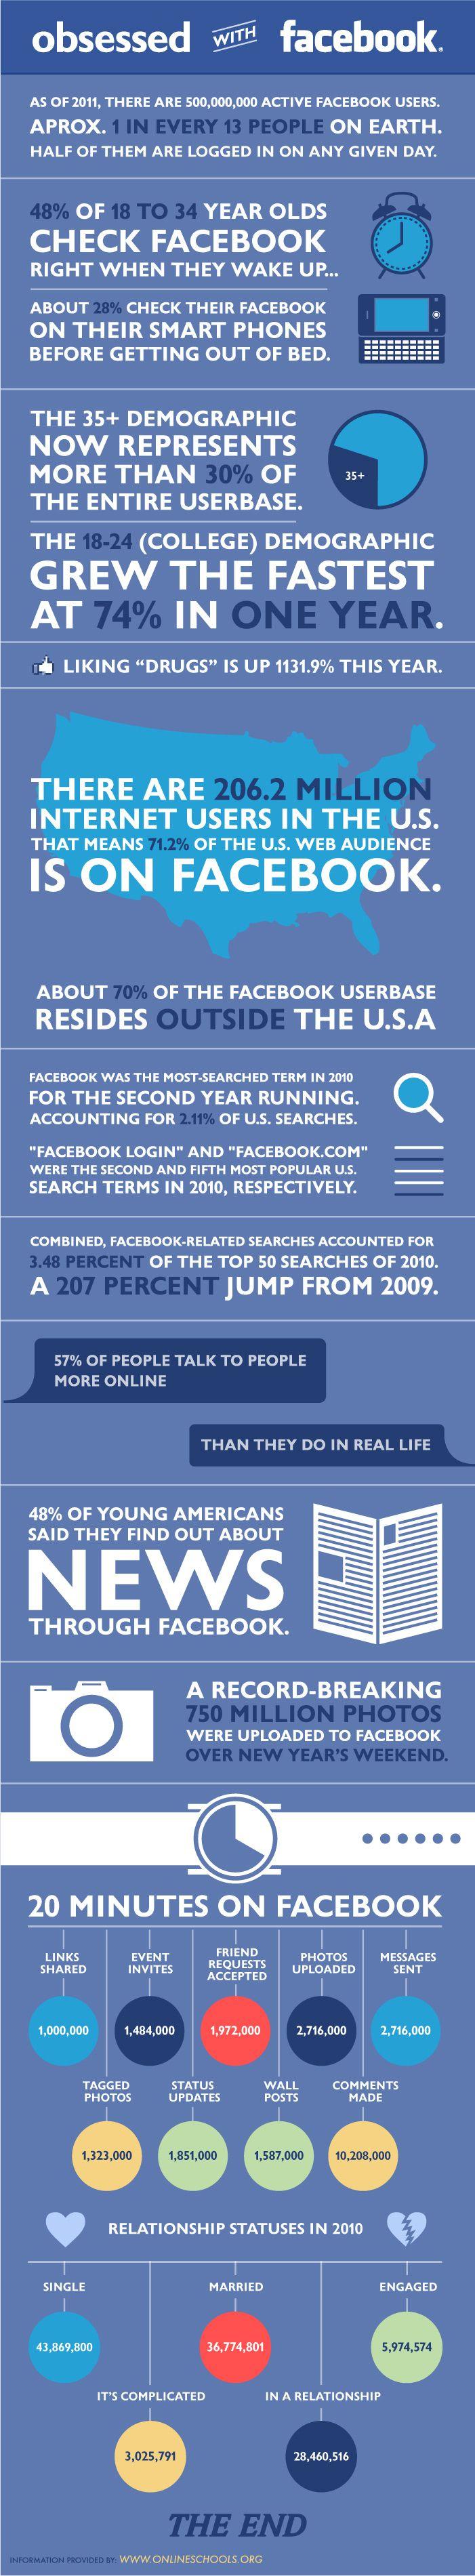 Obsesionados con Facebook